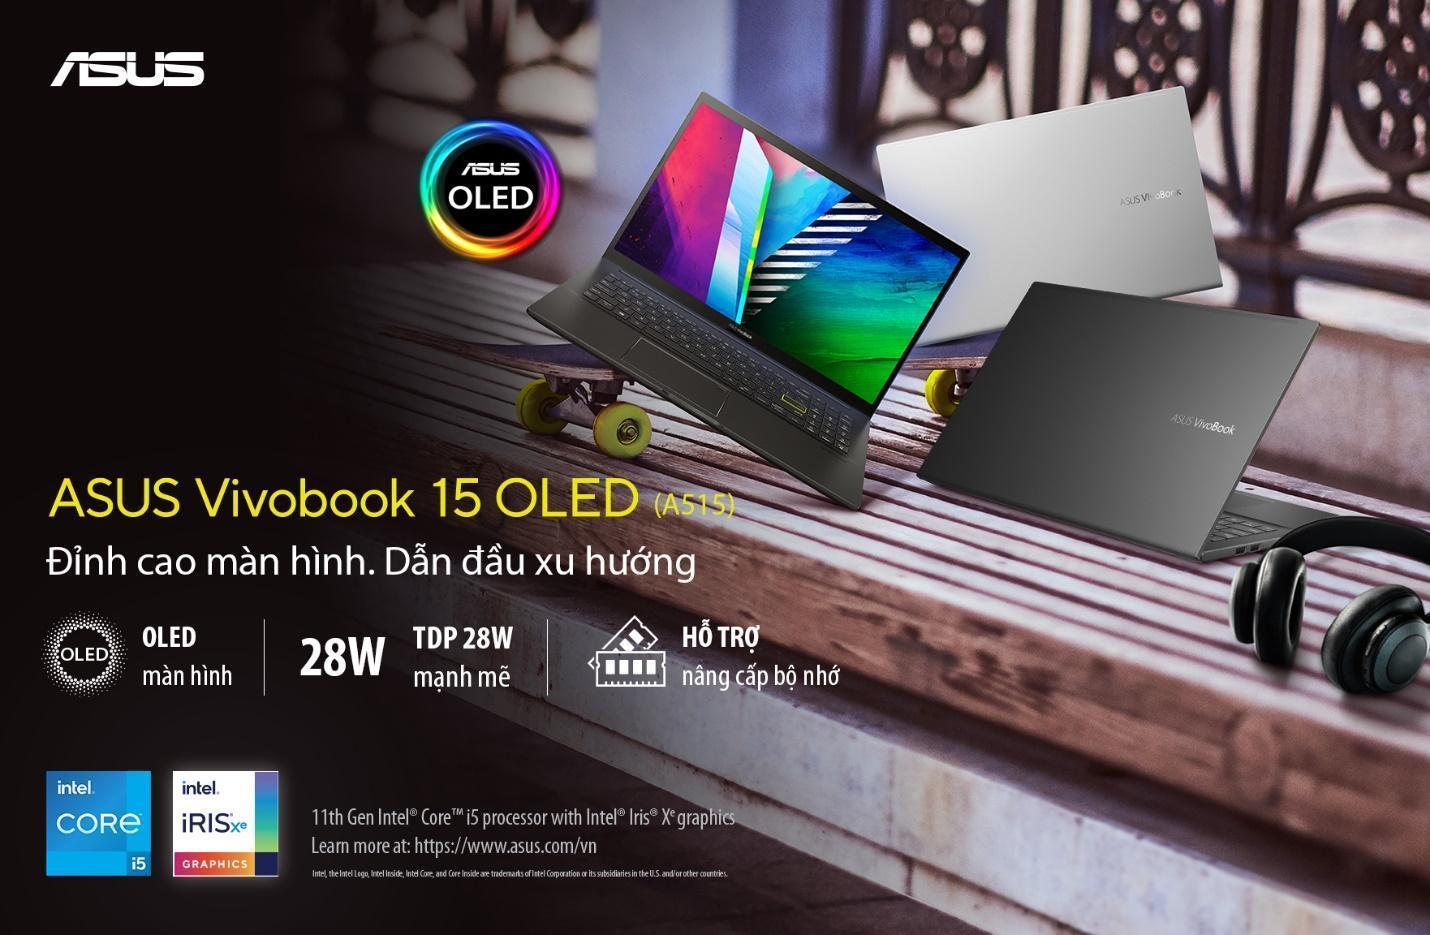 C:\Users\Asus\Desktop\Vivobook-15-OLED_KV.jpg